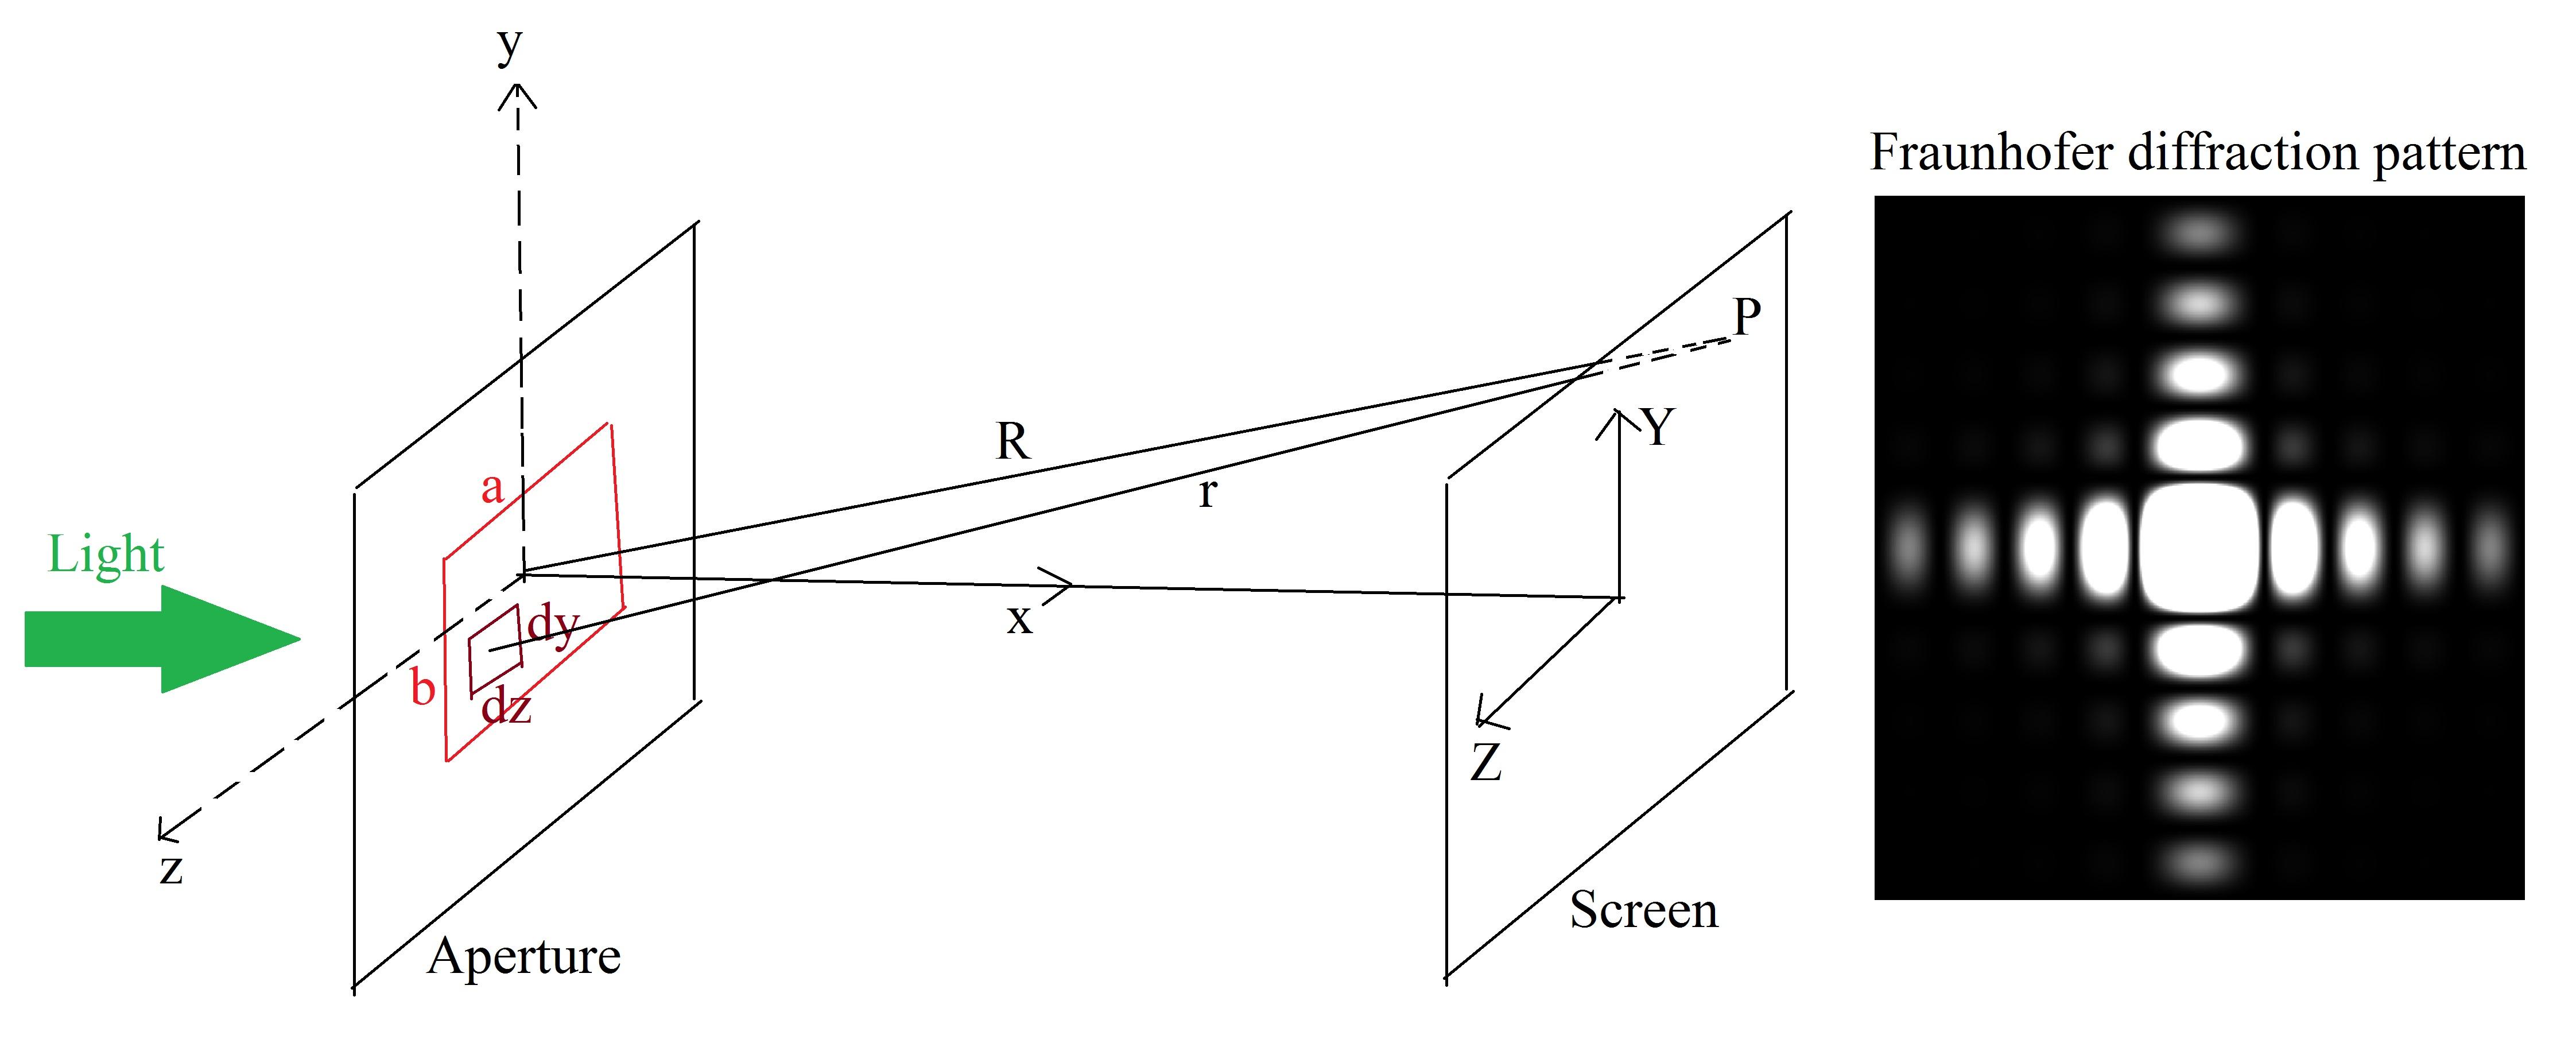 Fraunhofer Diffraction Of Light By A Rectangular Aperture